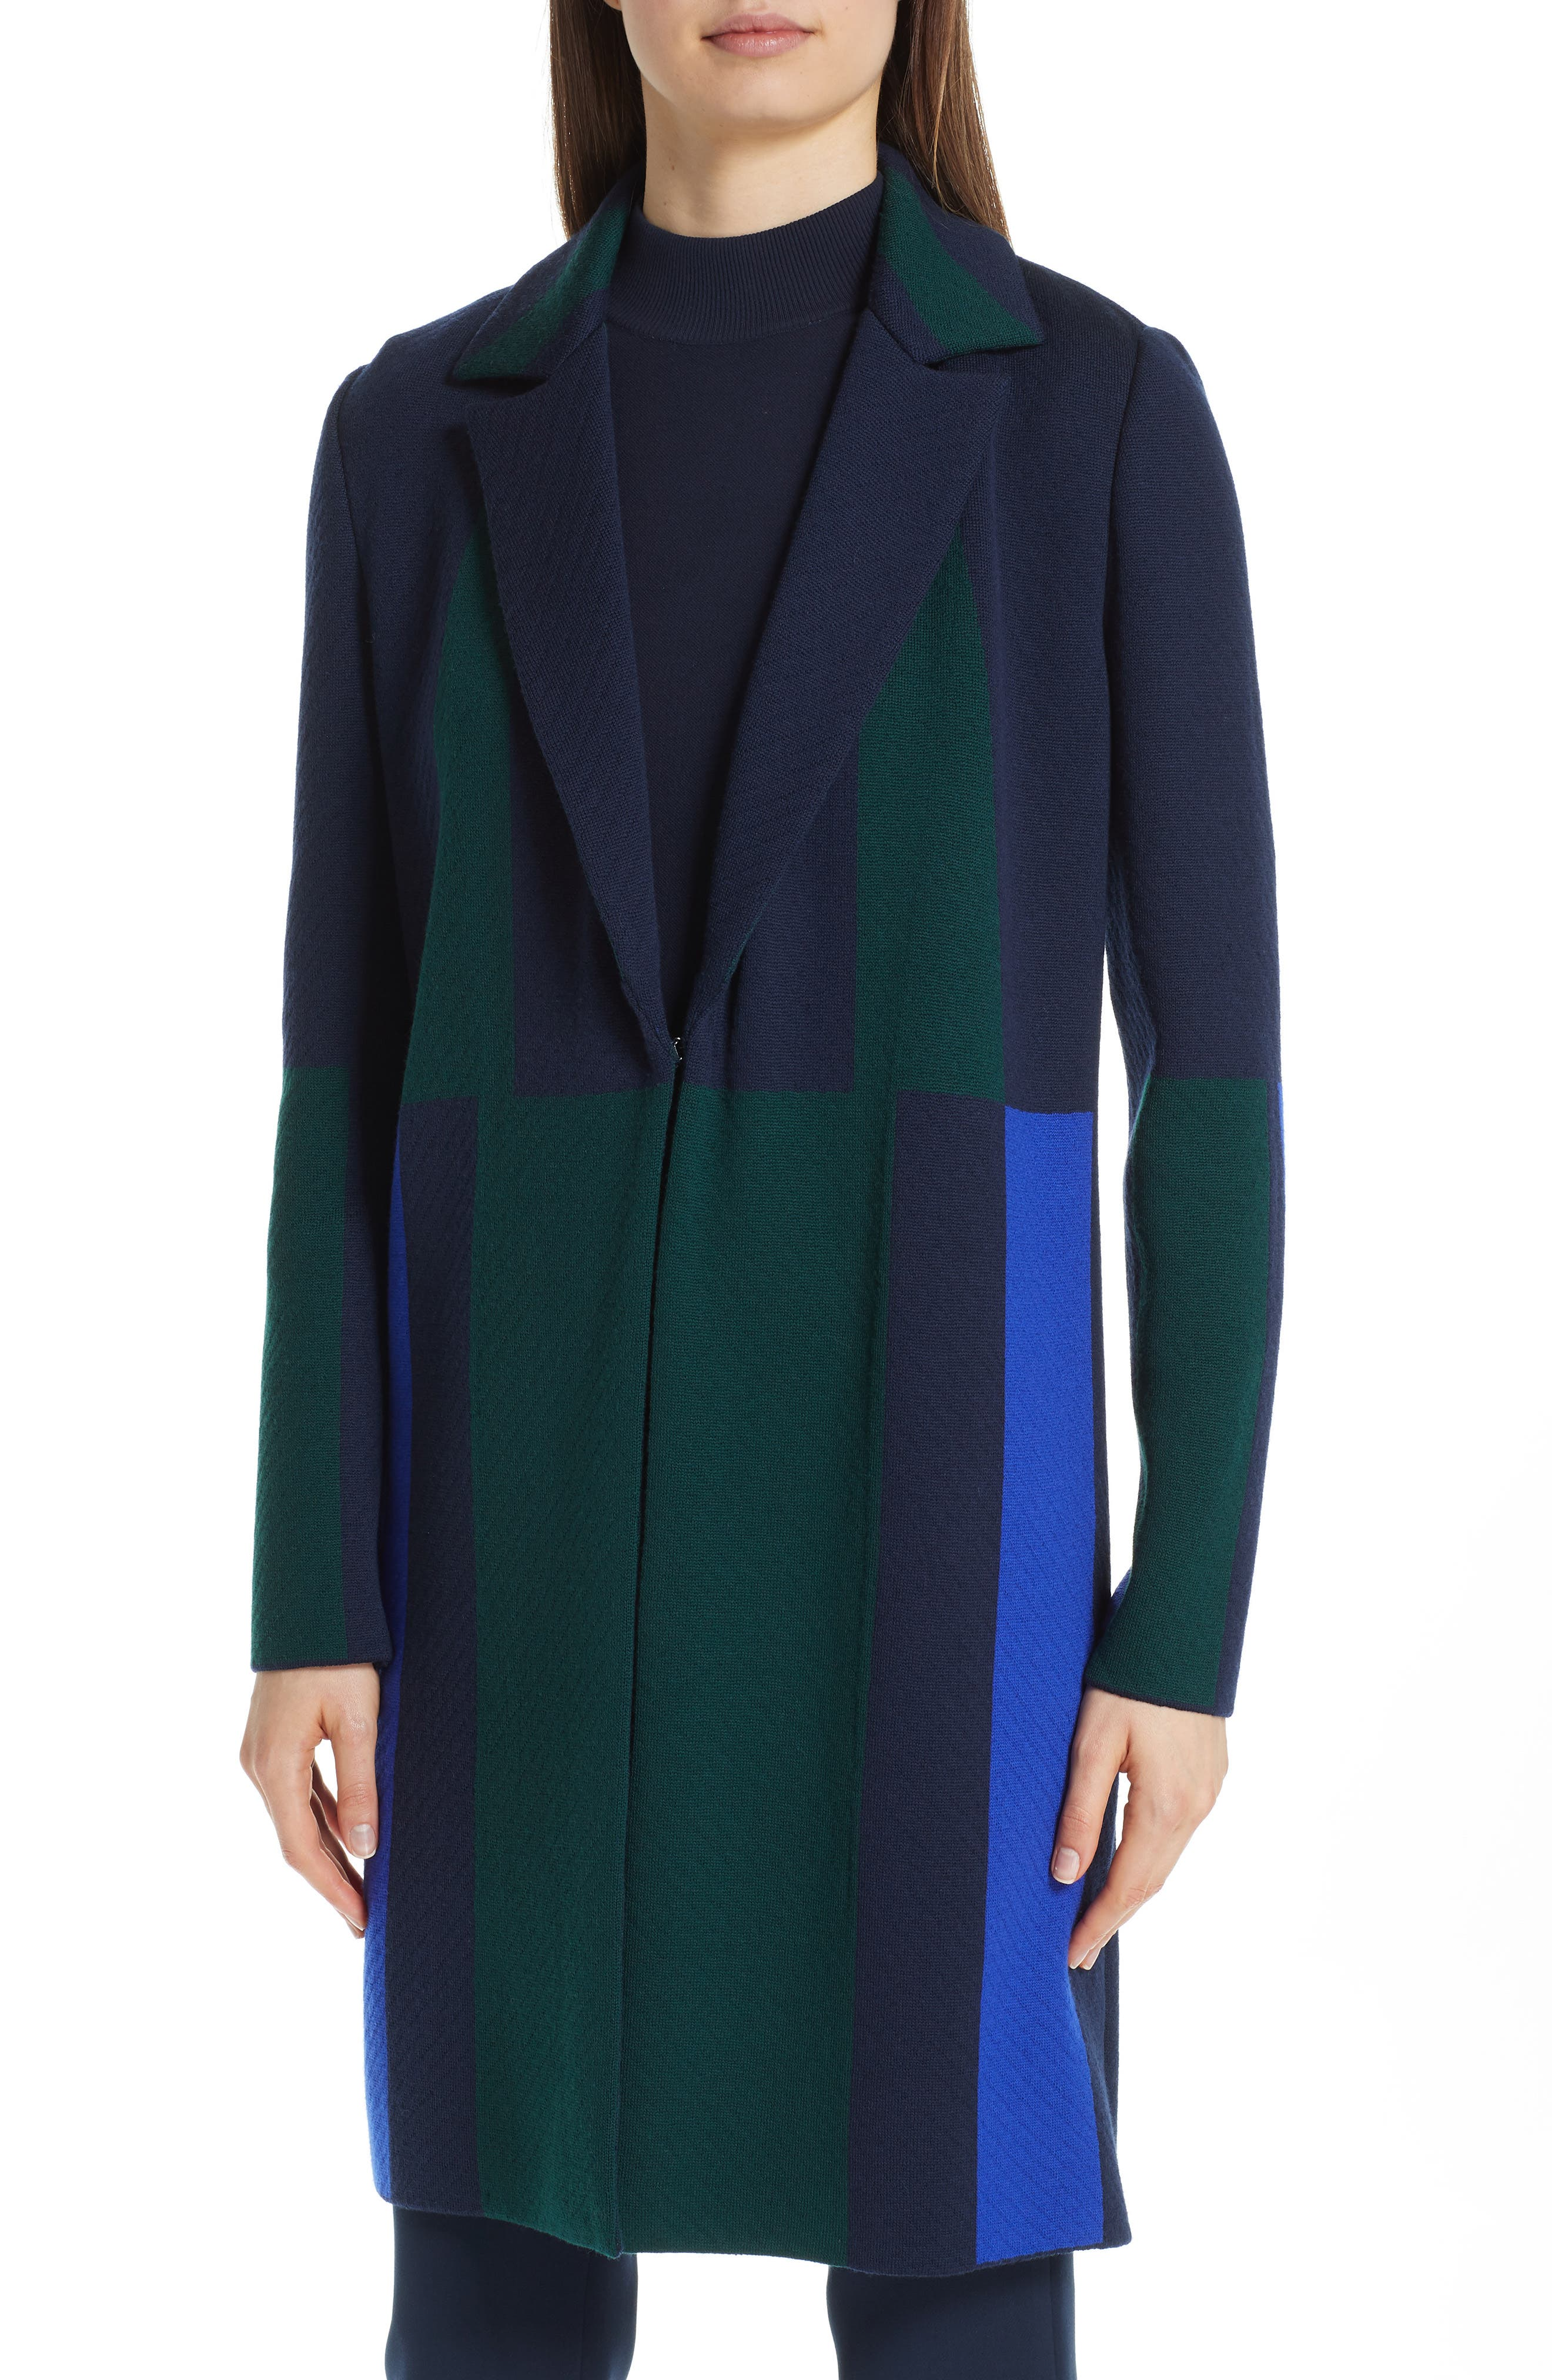 Colorblock Intarsia Wool Twill Jacket,                             Alternate thumbnail 4, color,                             NAVY MULTI